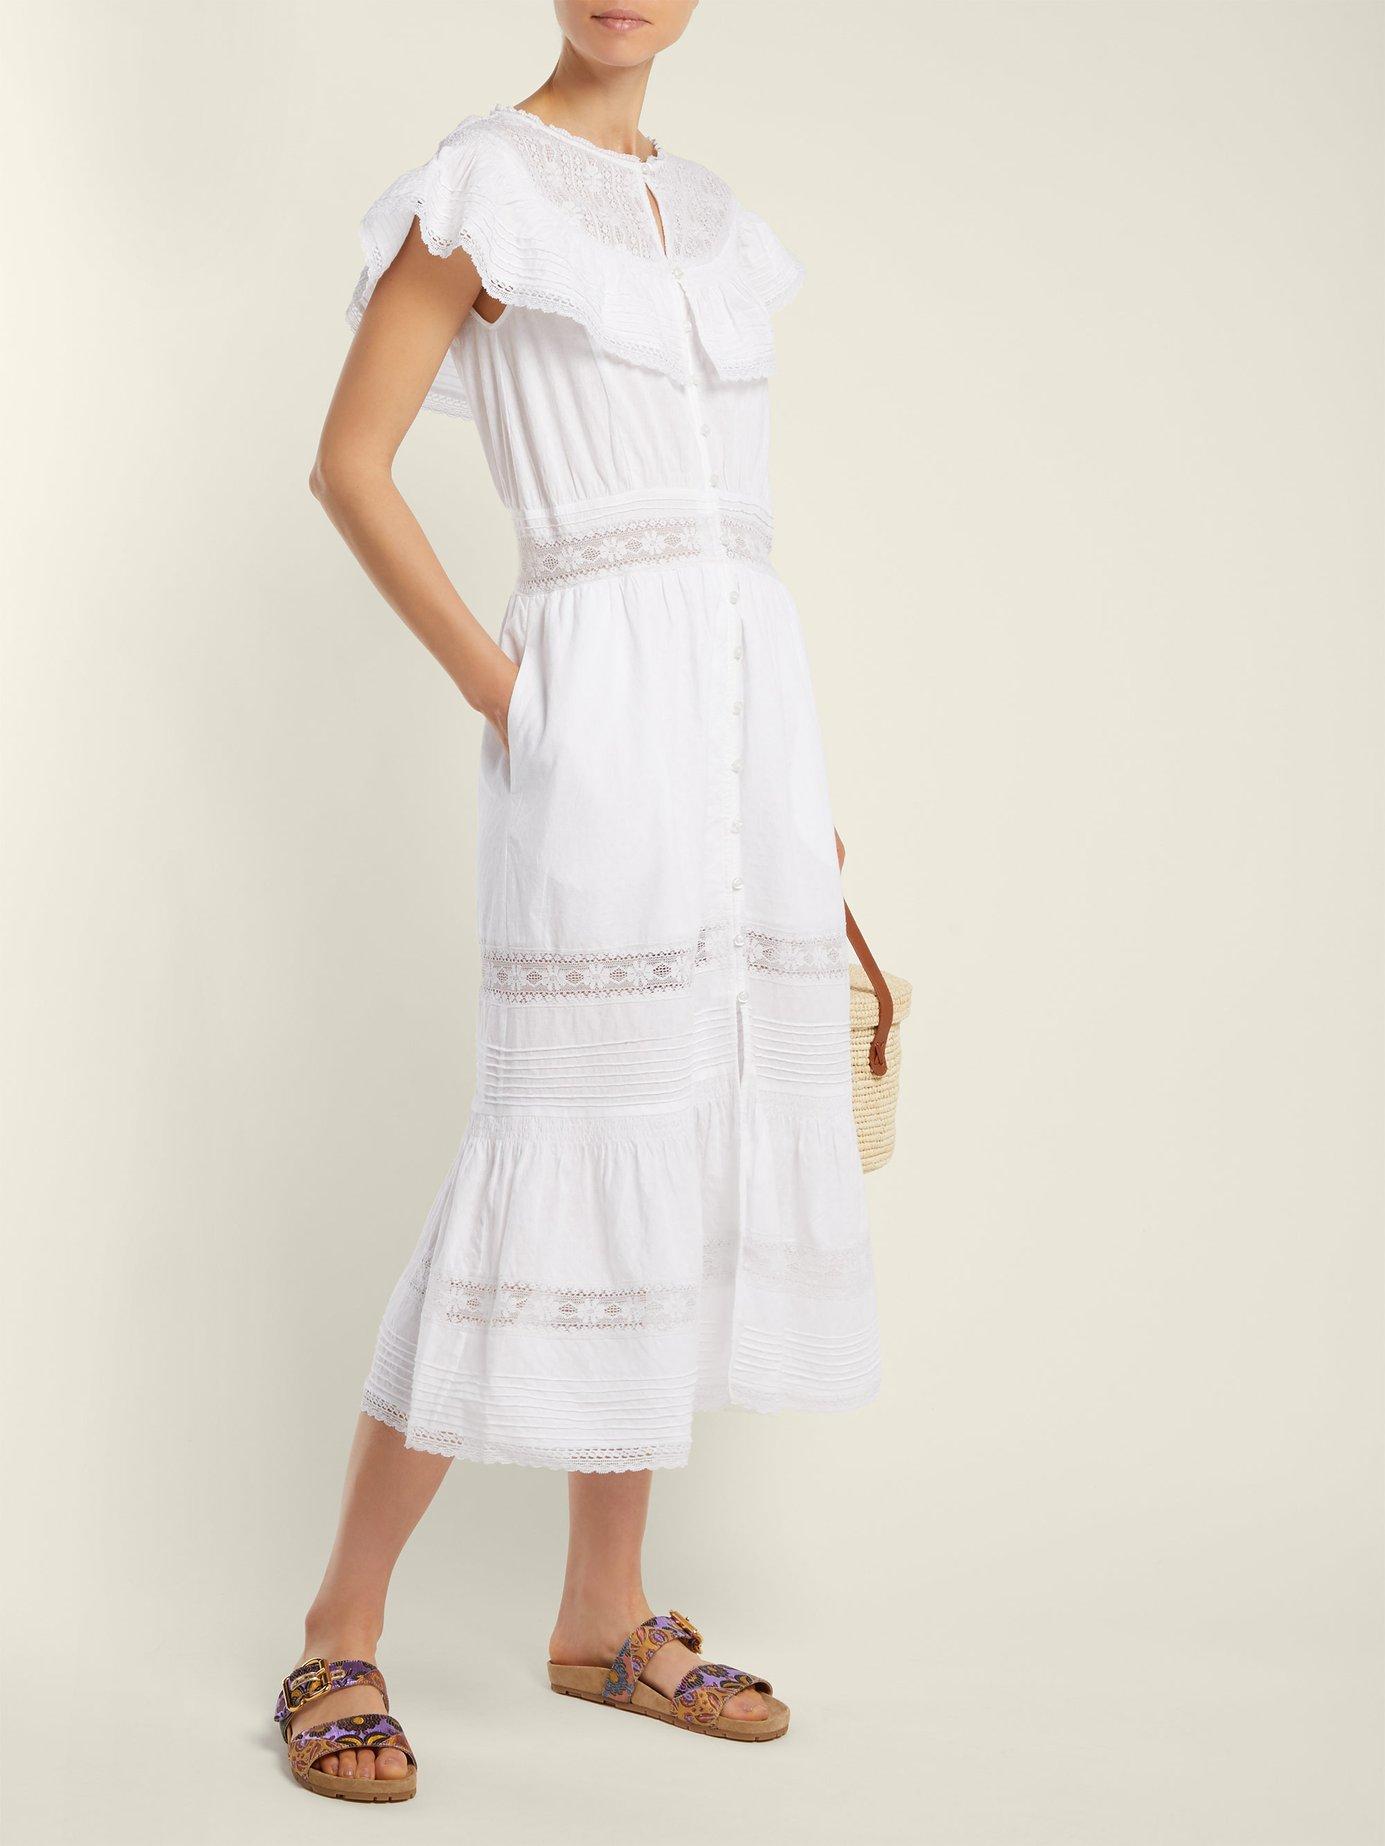 Lace-insert cotton dress by Sea